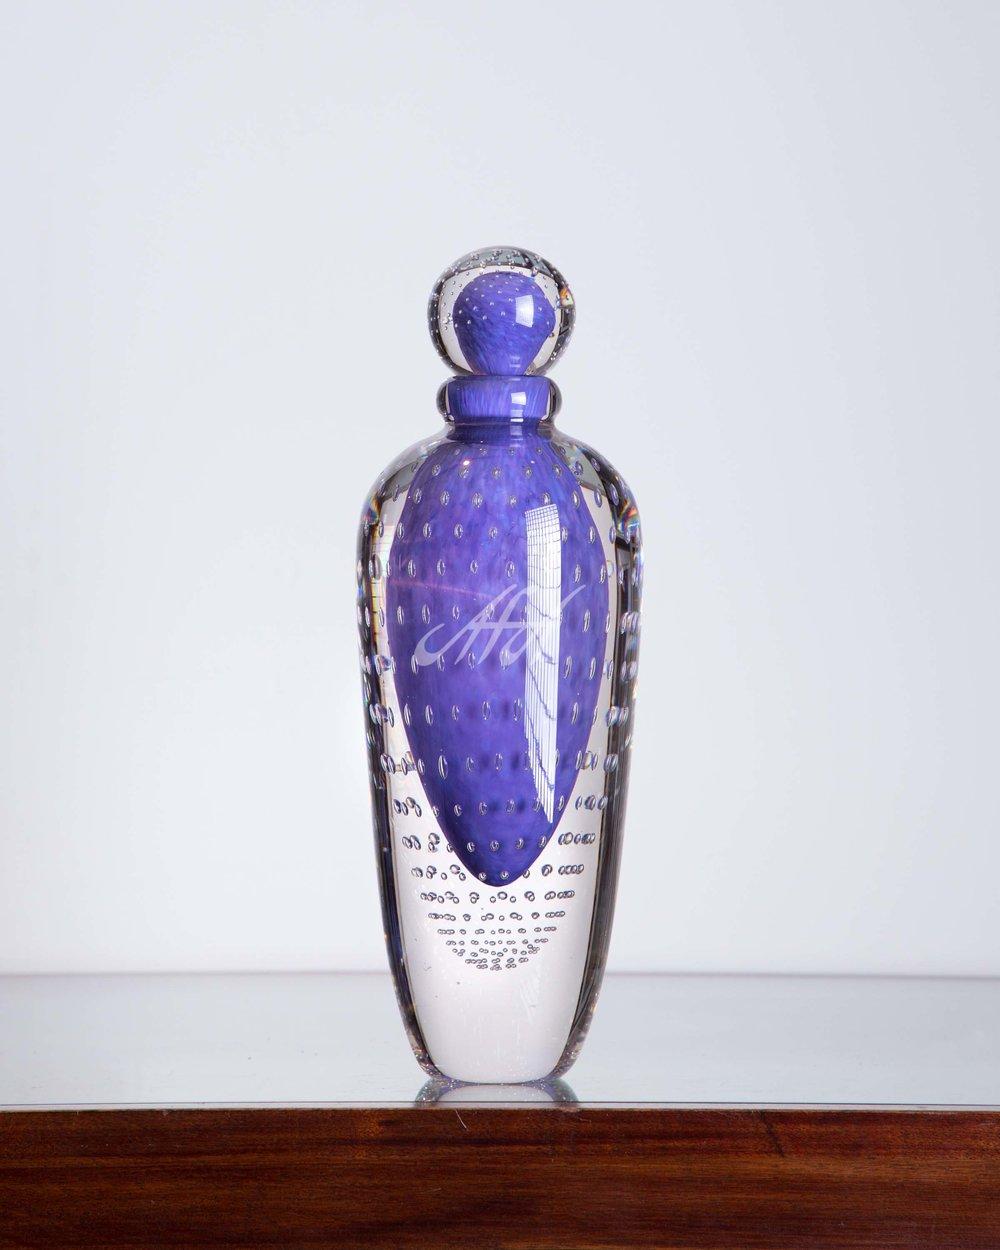 AFA_RB_lavender_bottle3 watermark lores.jpg